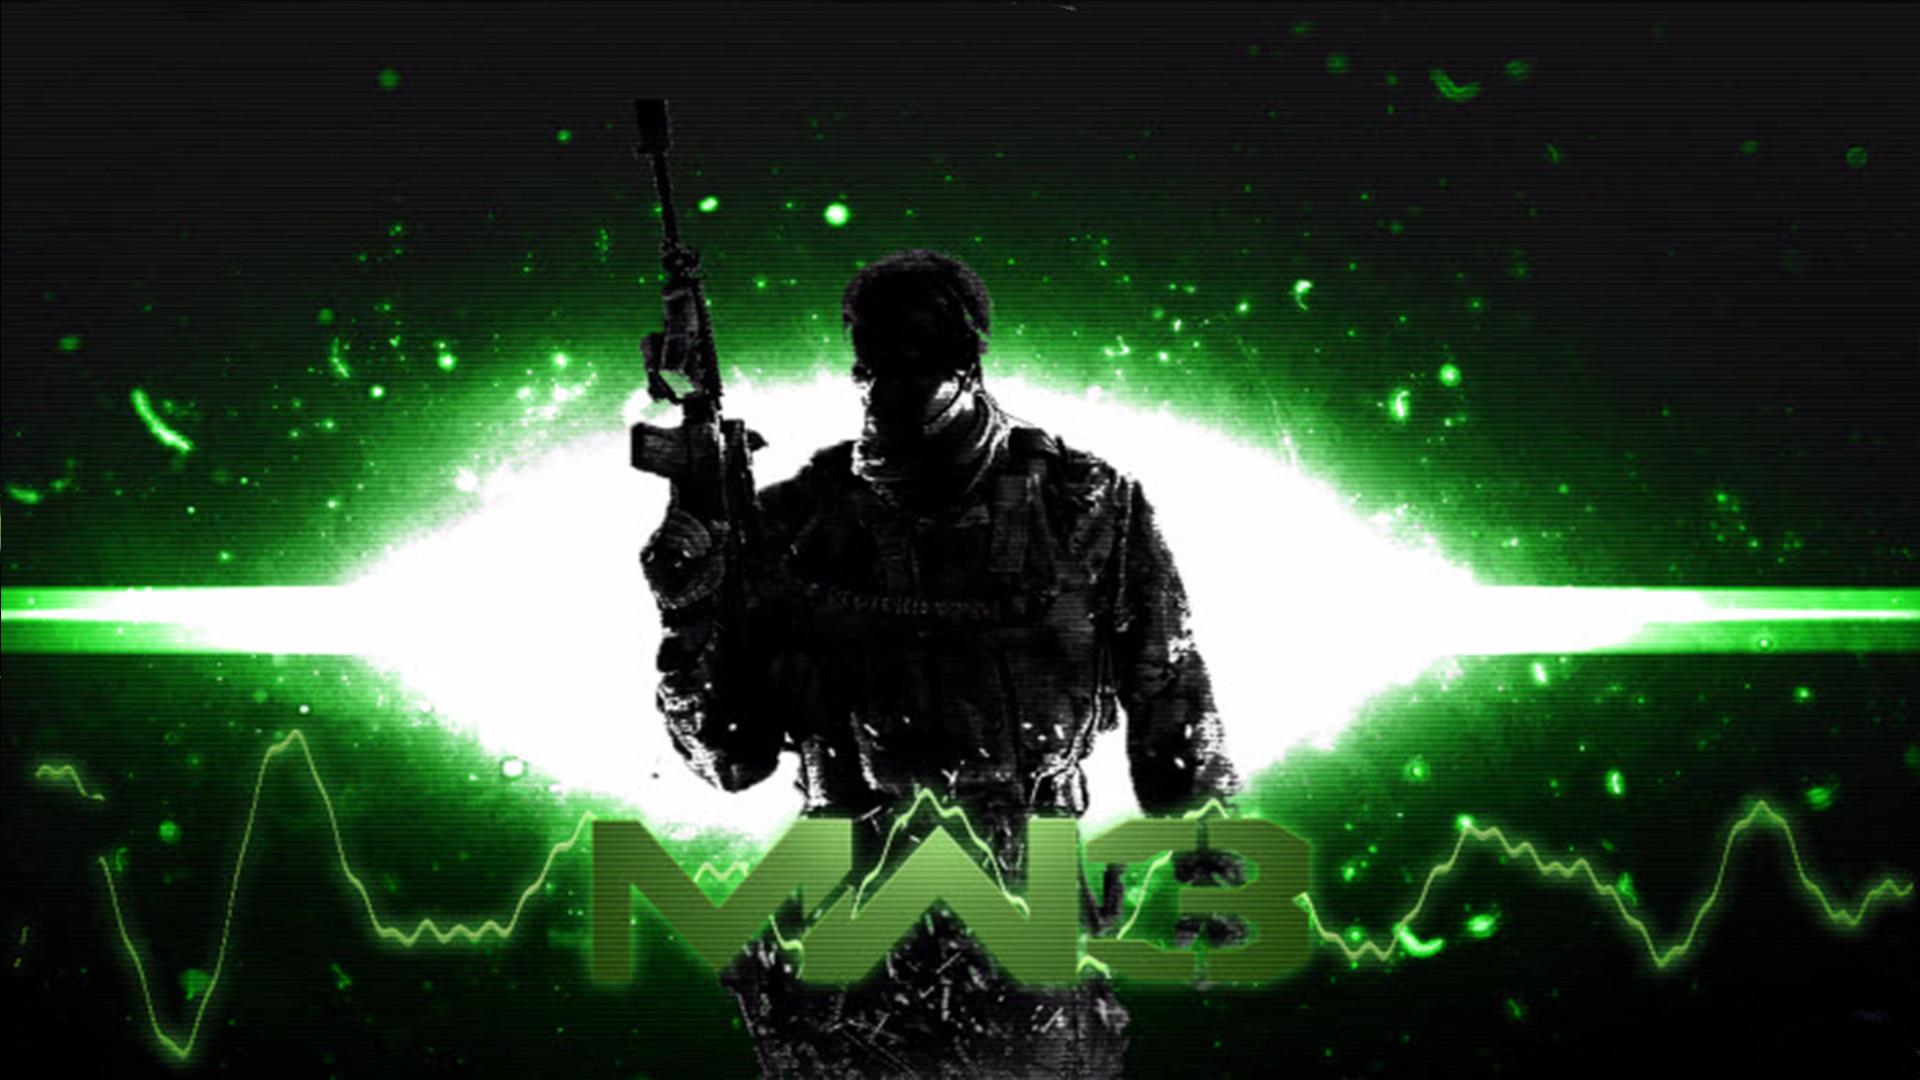 Call Of Duty Modern Warfare 3 Full Hd Wallpaper And